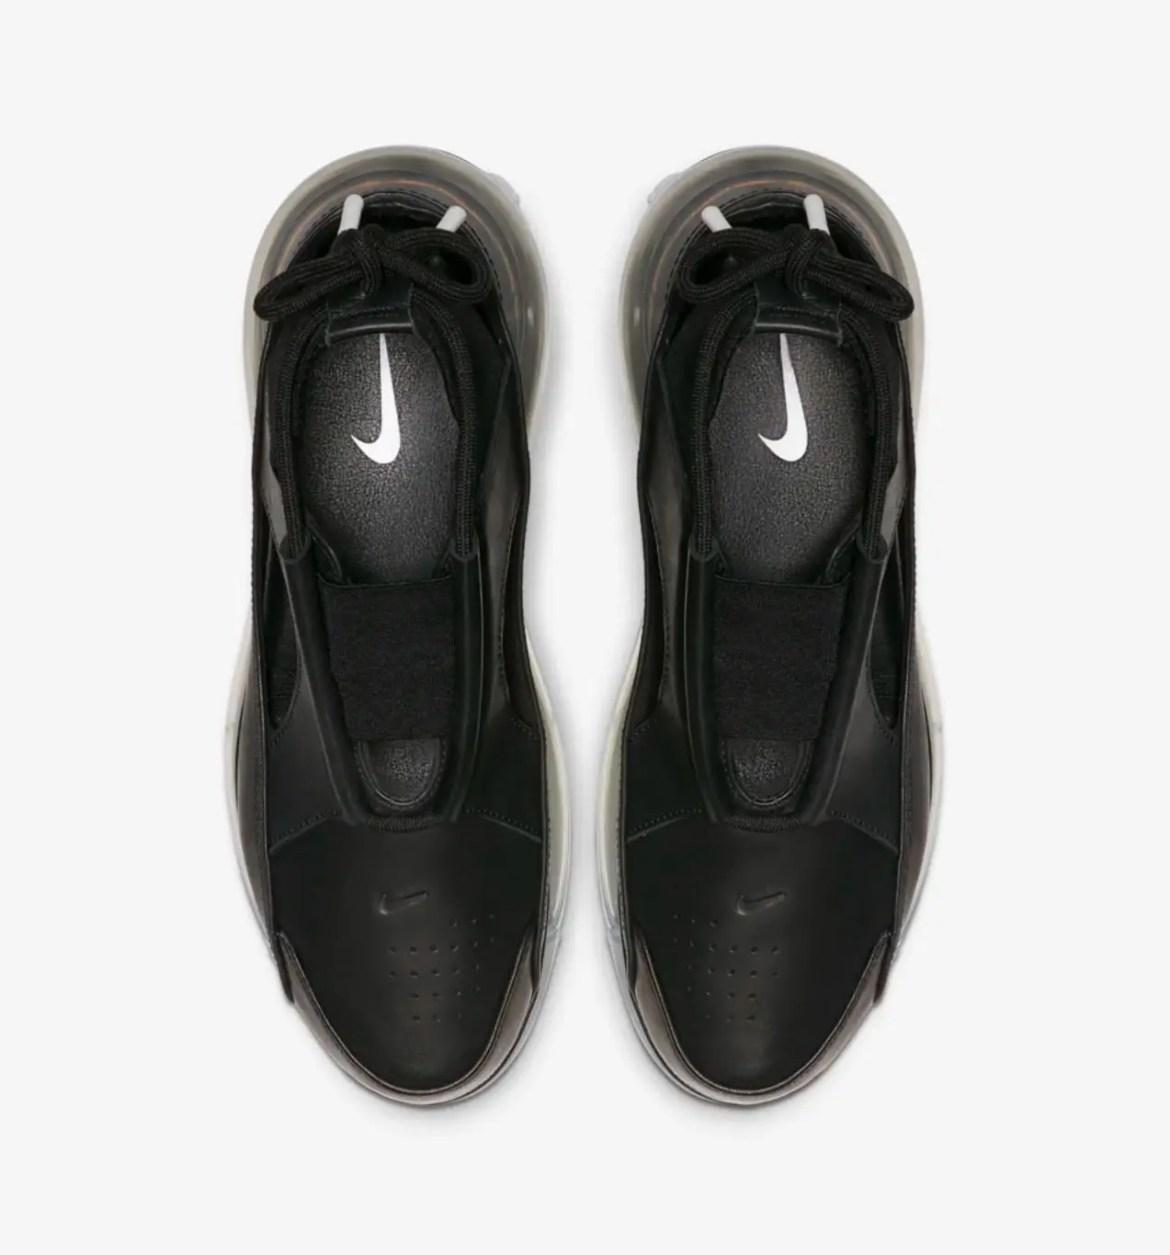 Nike-Air-Max-FF-720-Black-AO3189-001-Release-Date-03